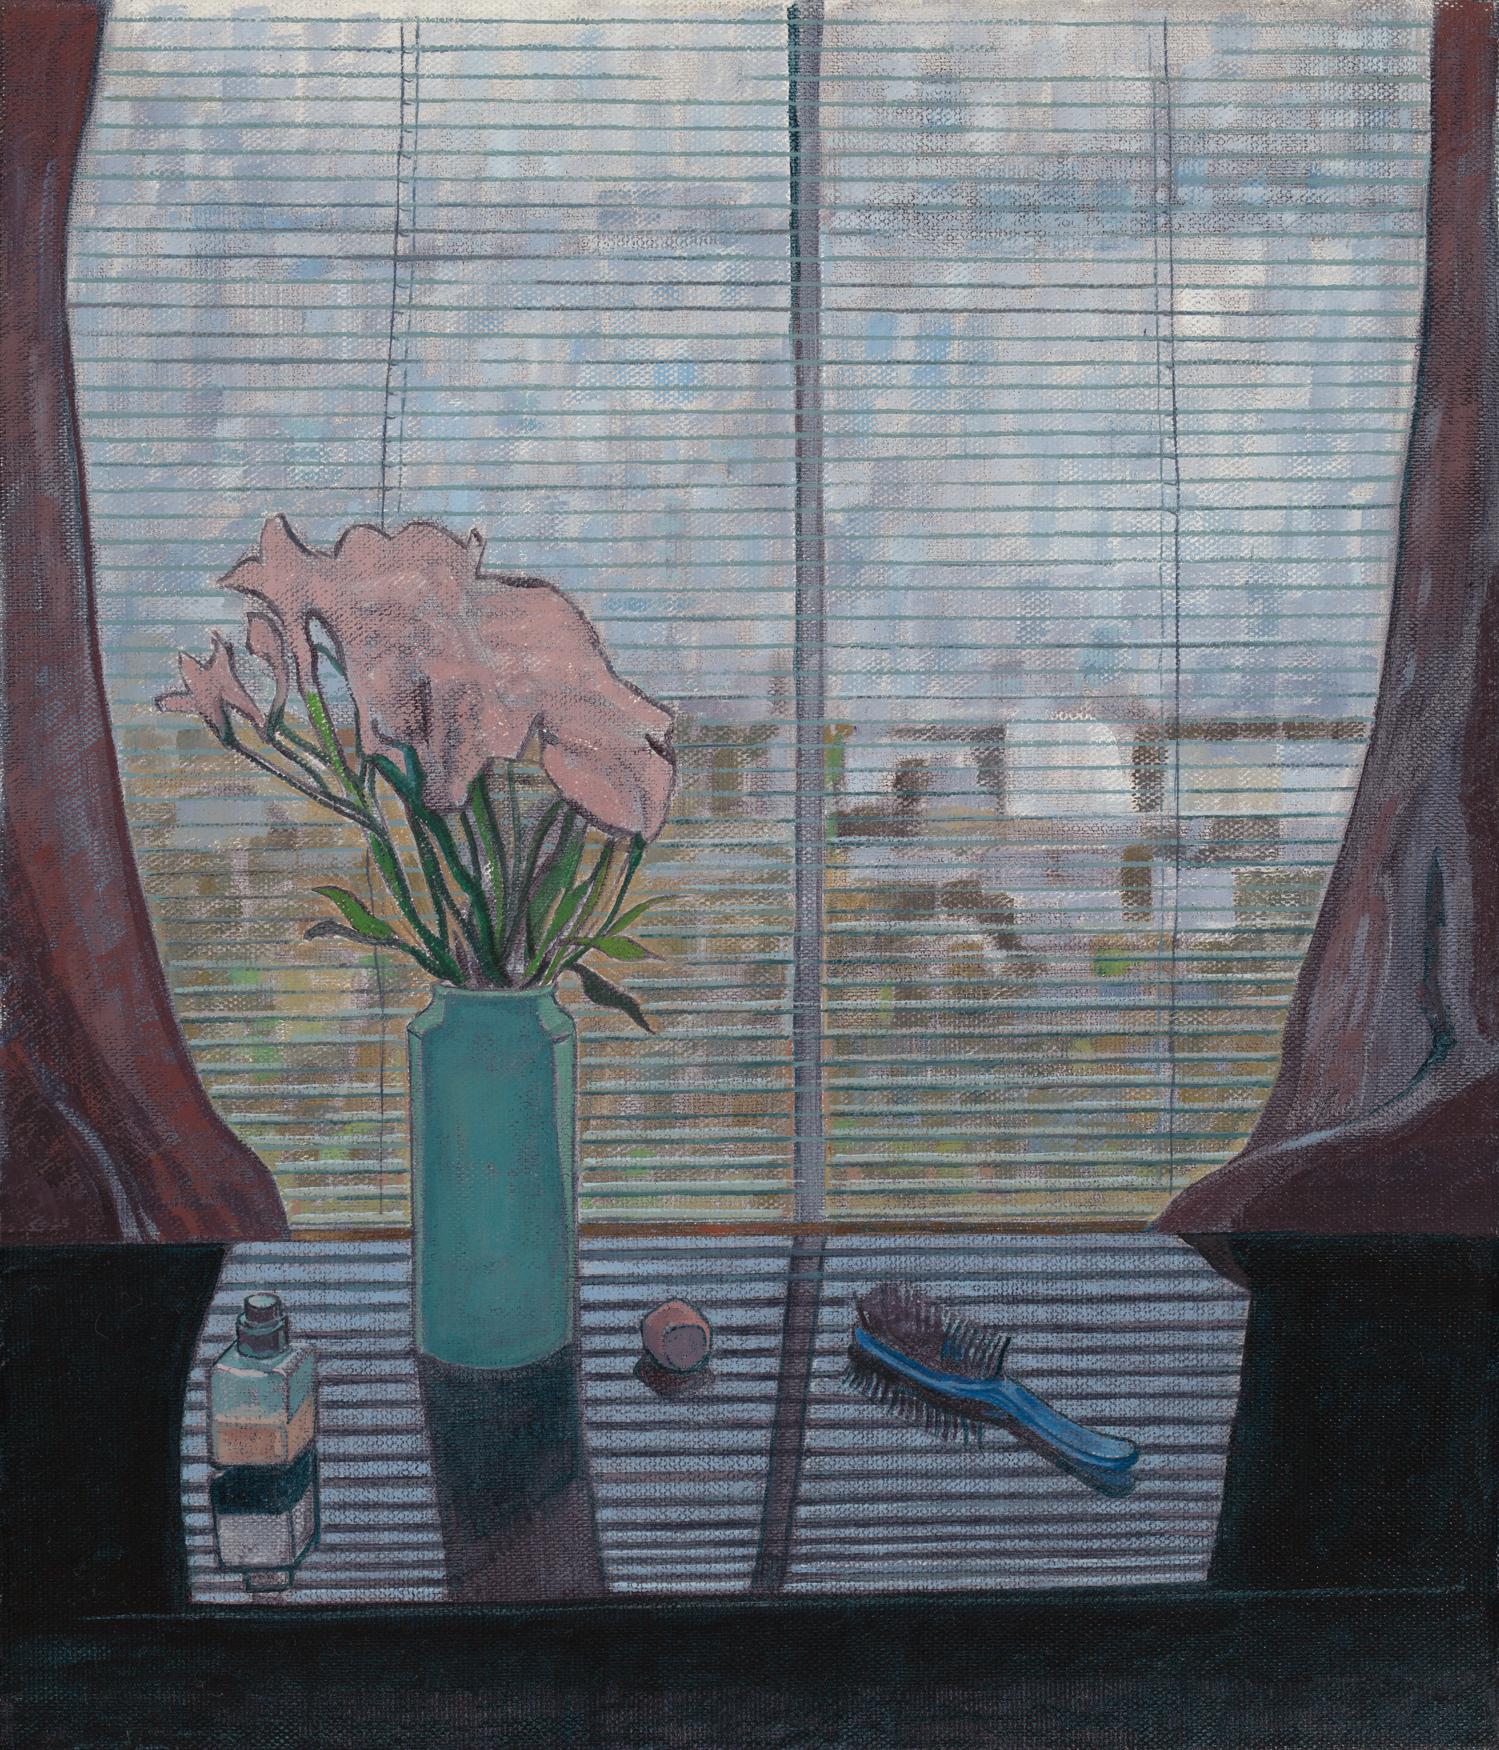 11. Dayan Jesse, 'Mid Afternoon', 35x30cm, Oil on Linen, 2017.jpg